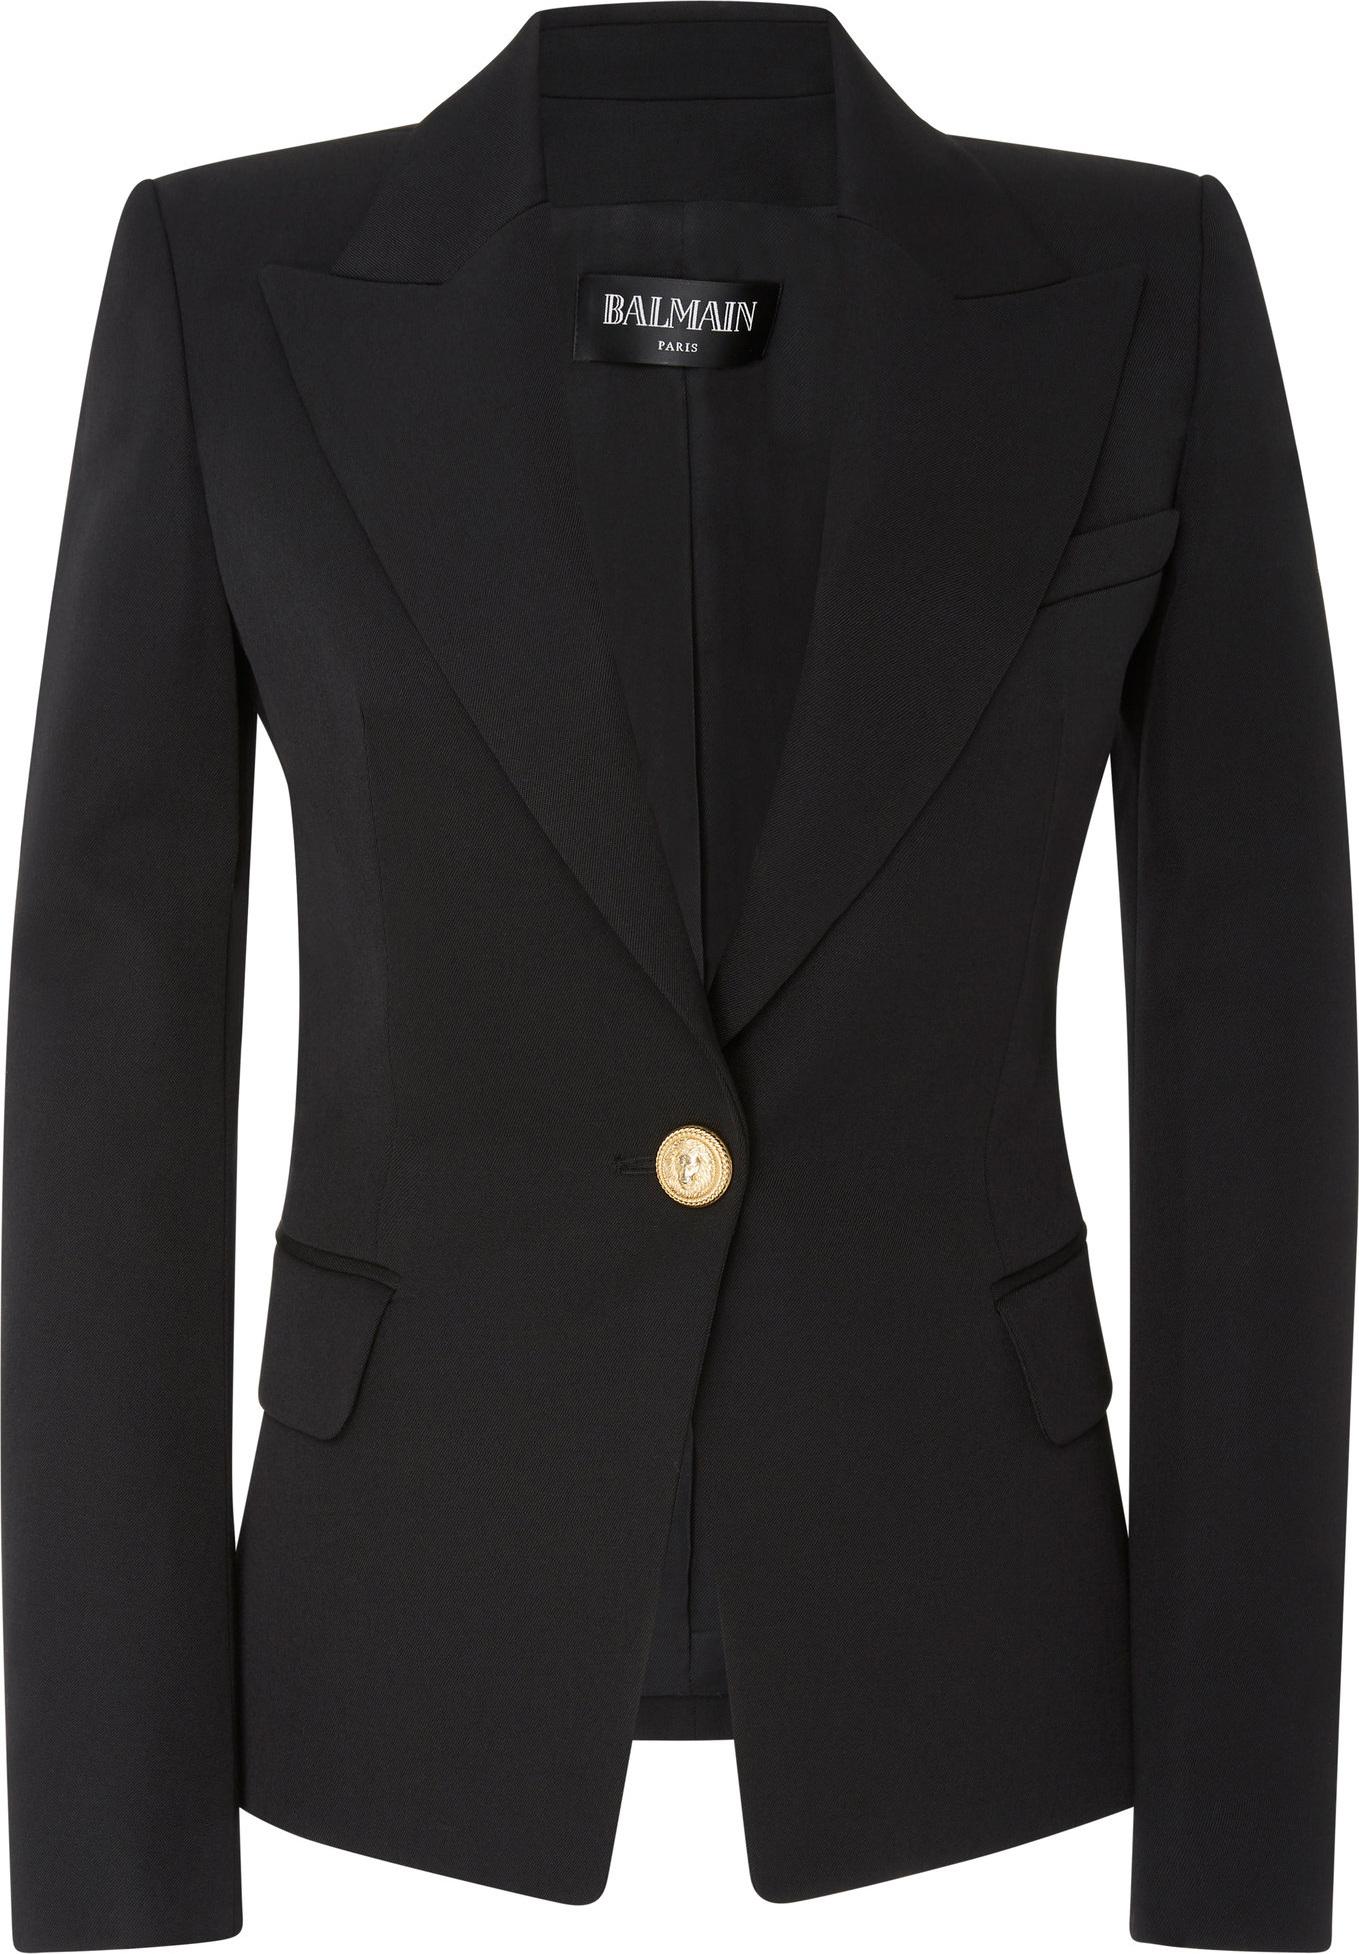 Balmain - Tailored One Button Wool Blazer